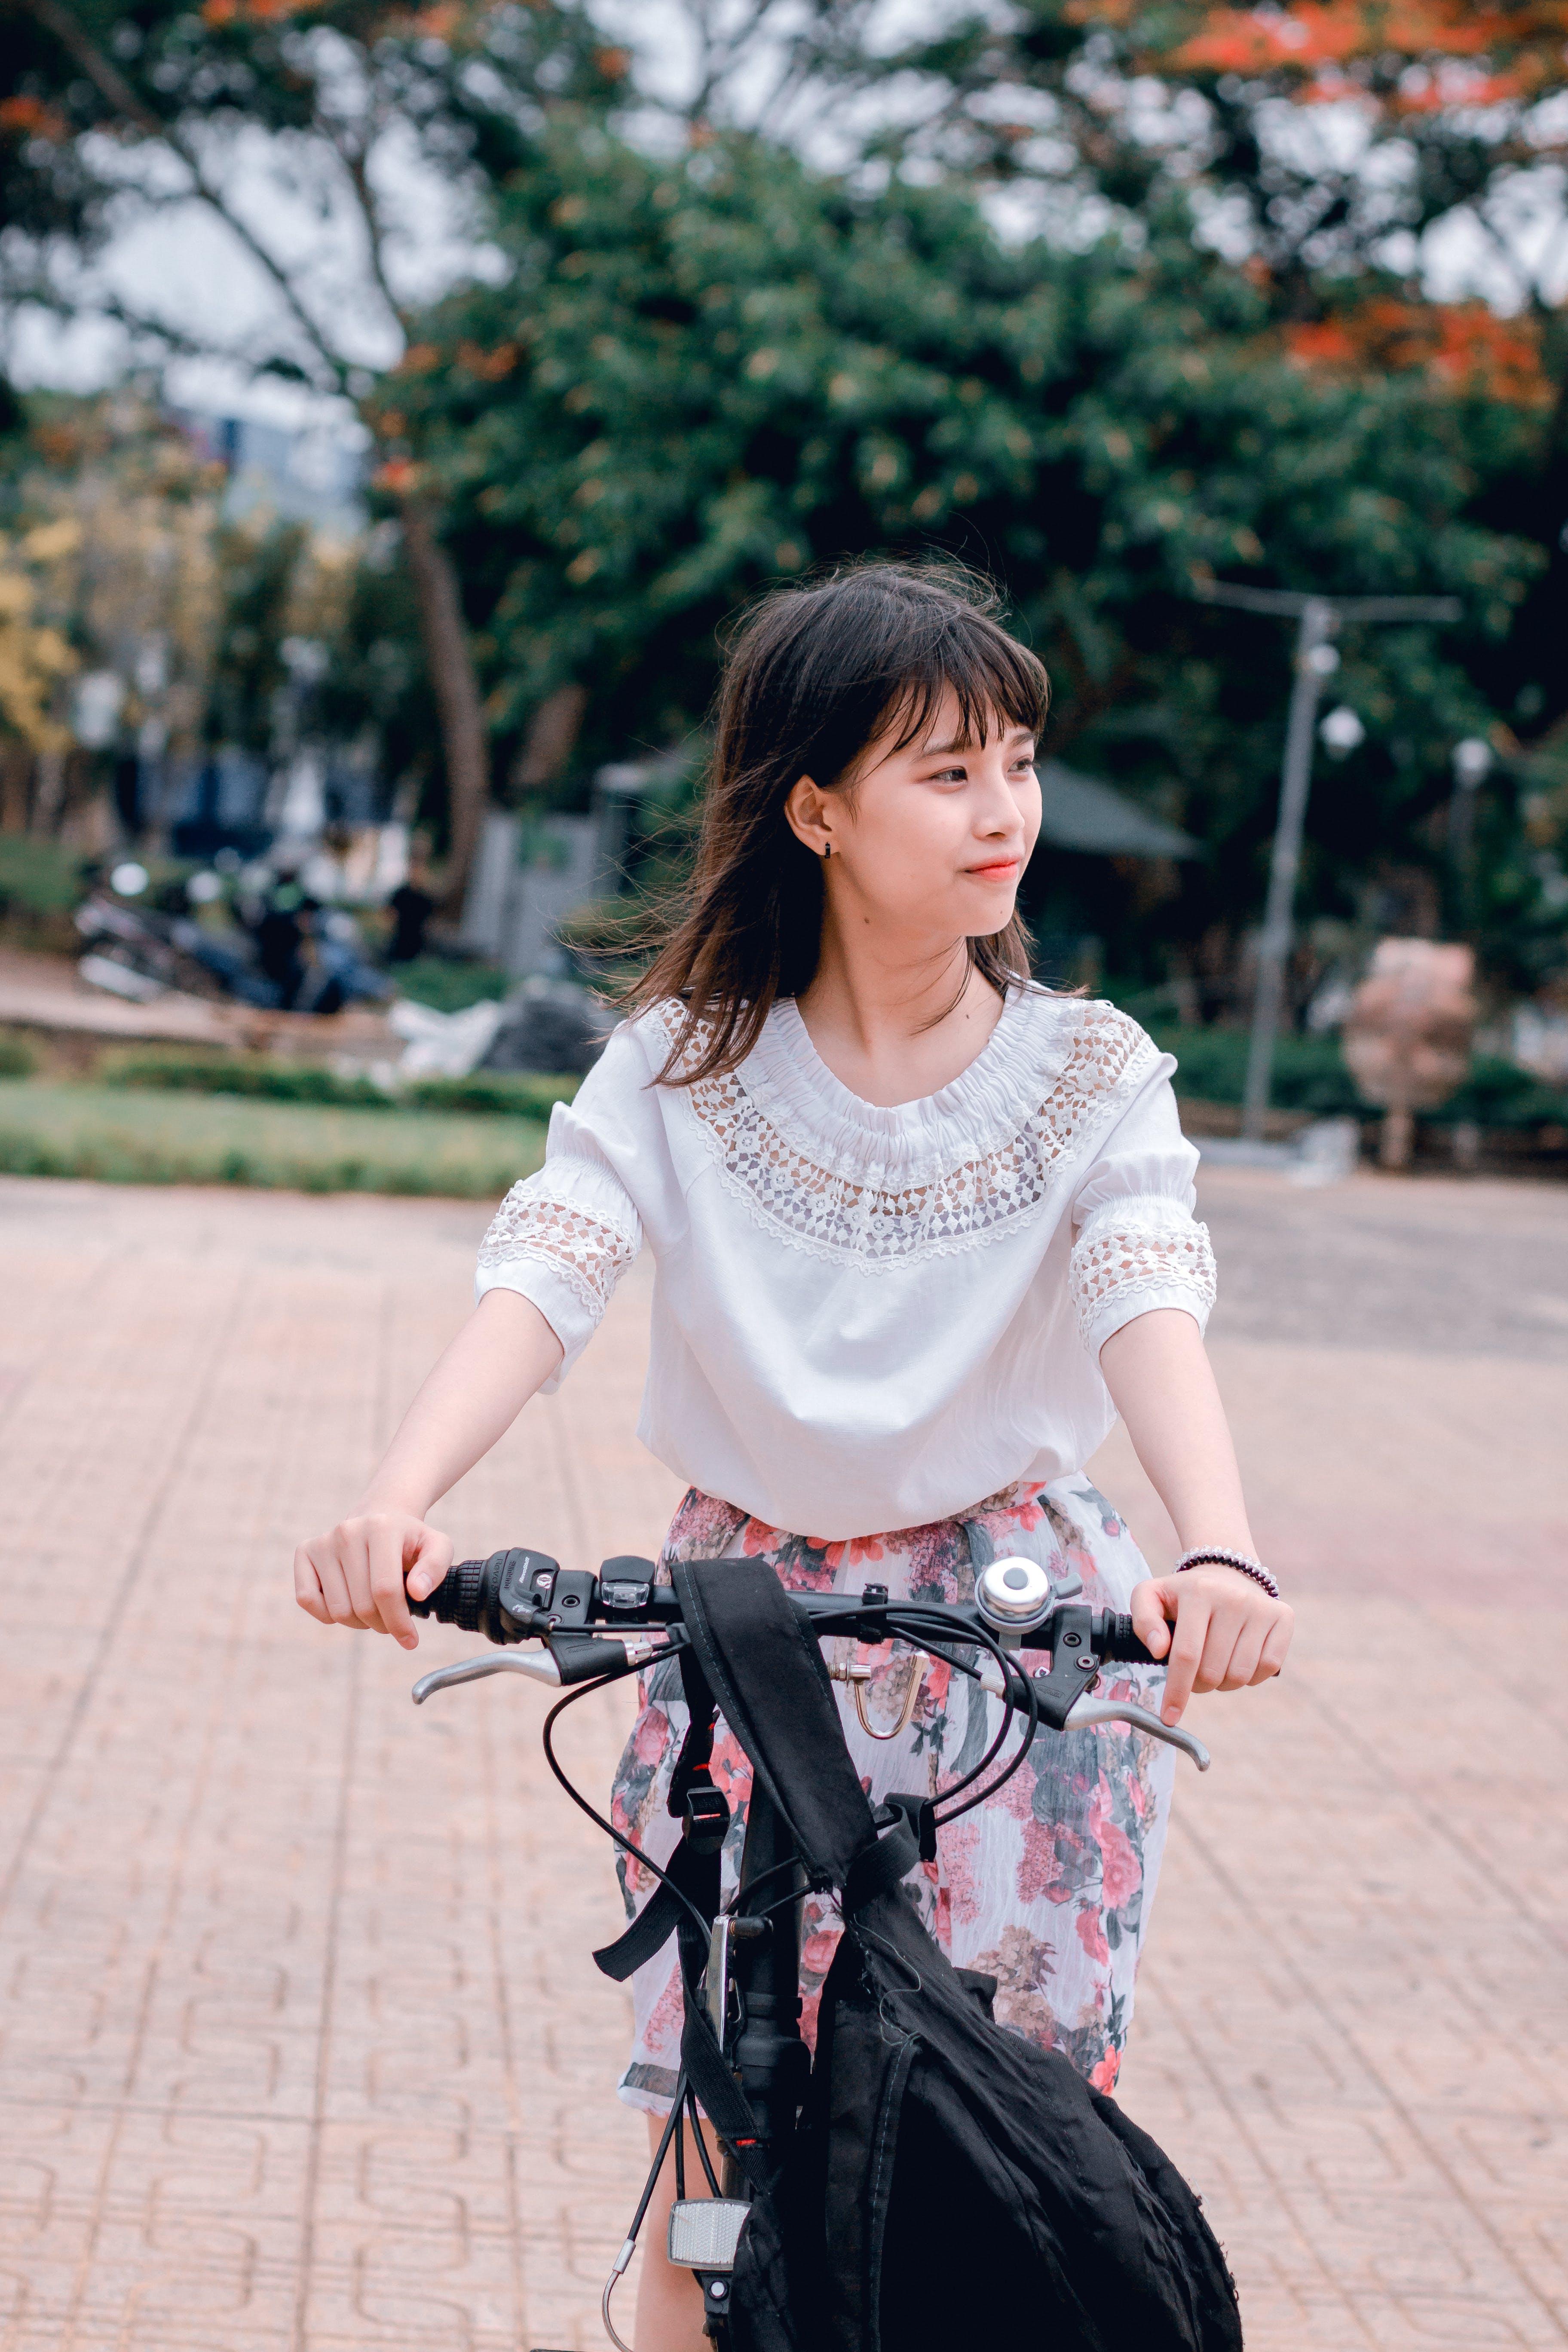 Kostenloses Stock Foto zu fahrrad, fashion, fotoshooting, frau